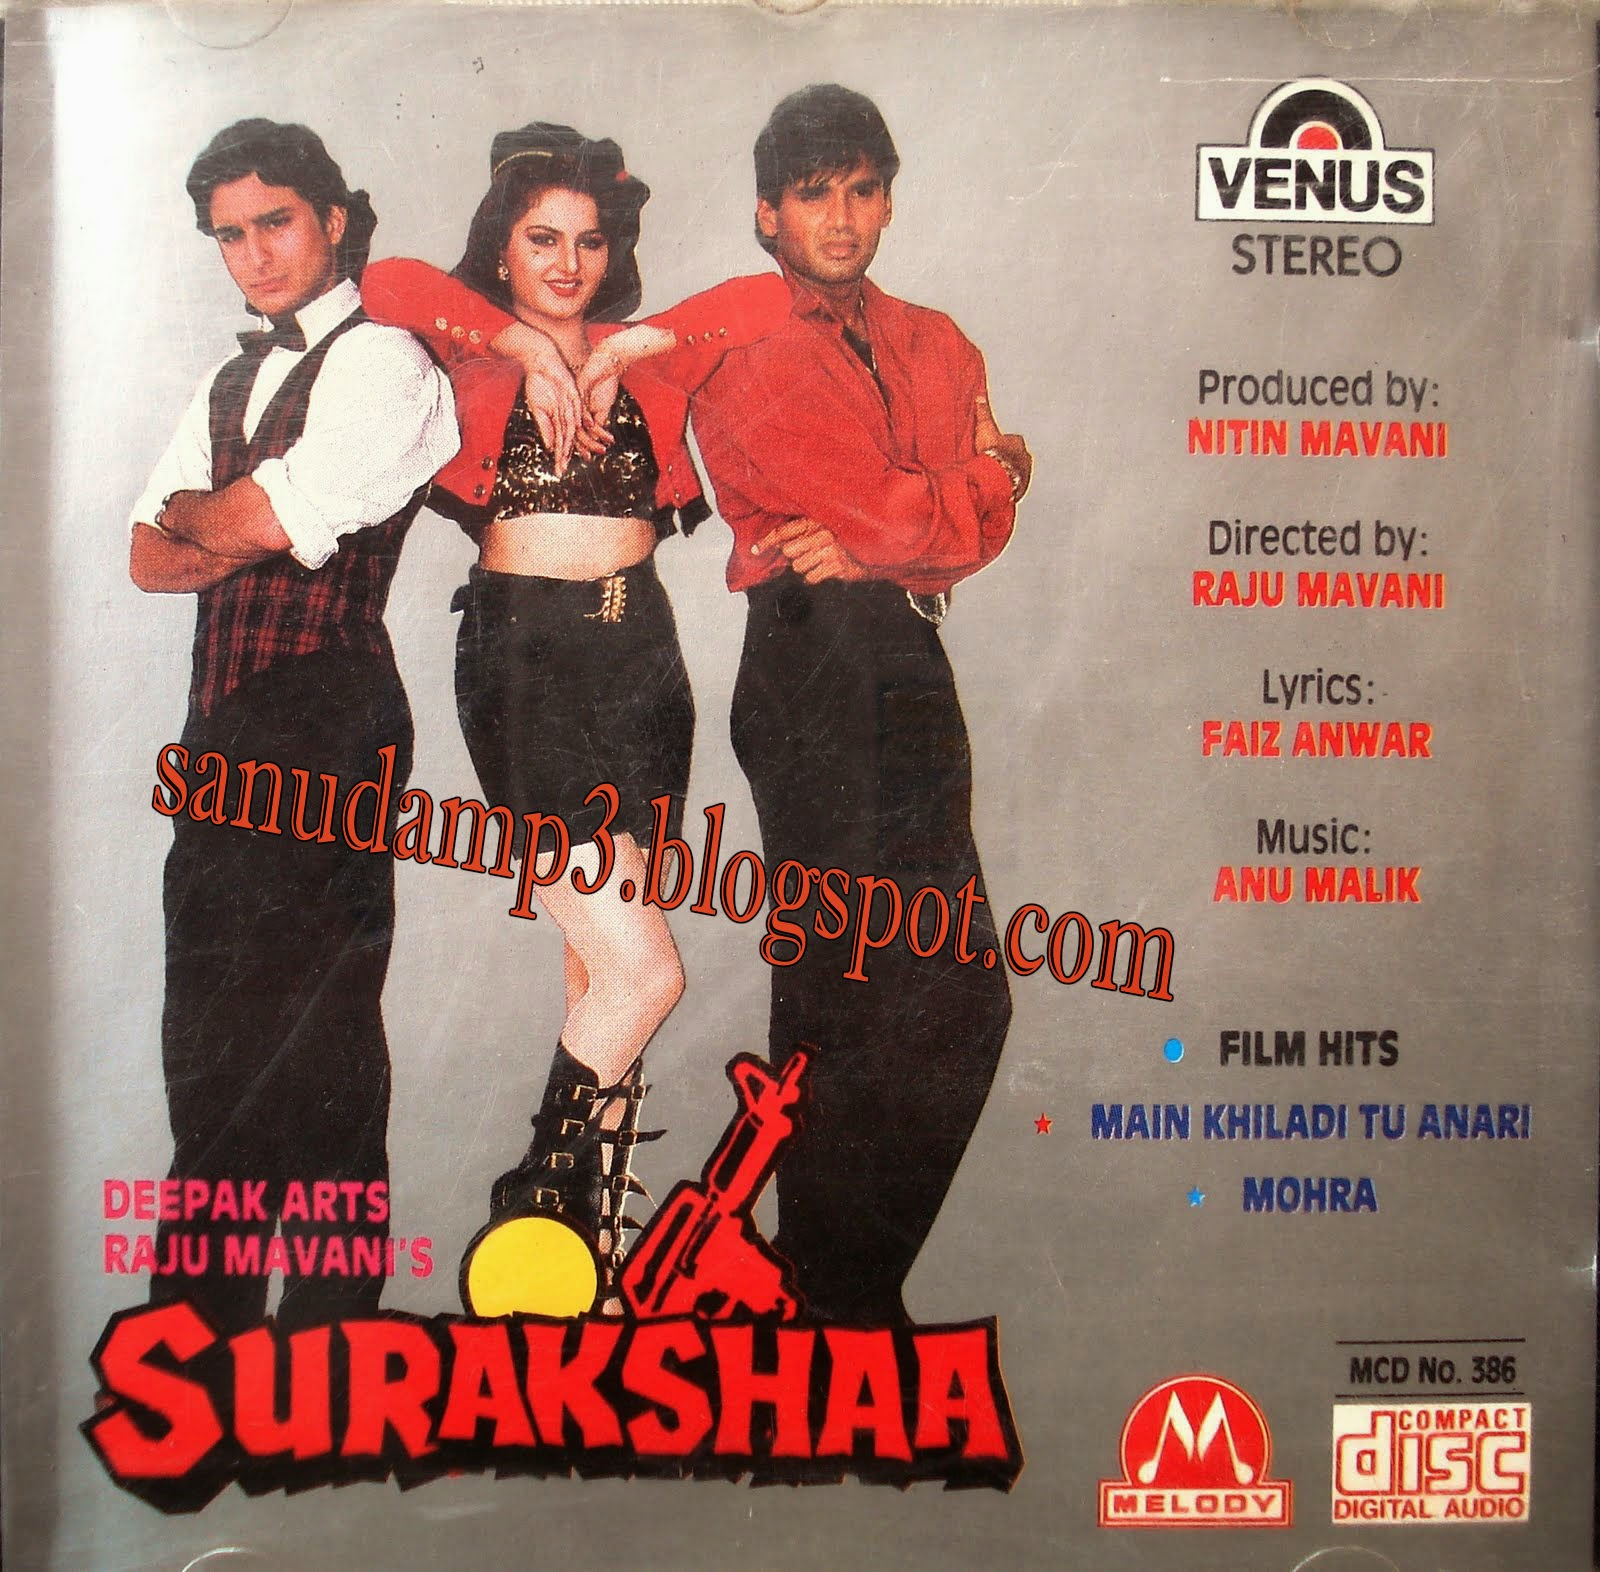 Download Lagu Ost Dil Se Dil Tak: Sanudamp3.blogspot.com: Surakshaa(1996